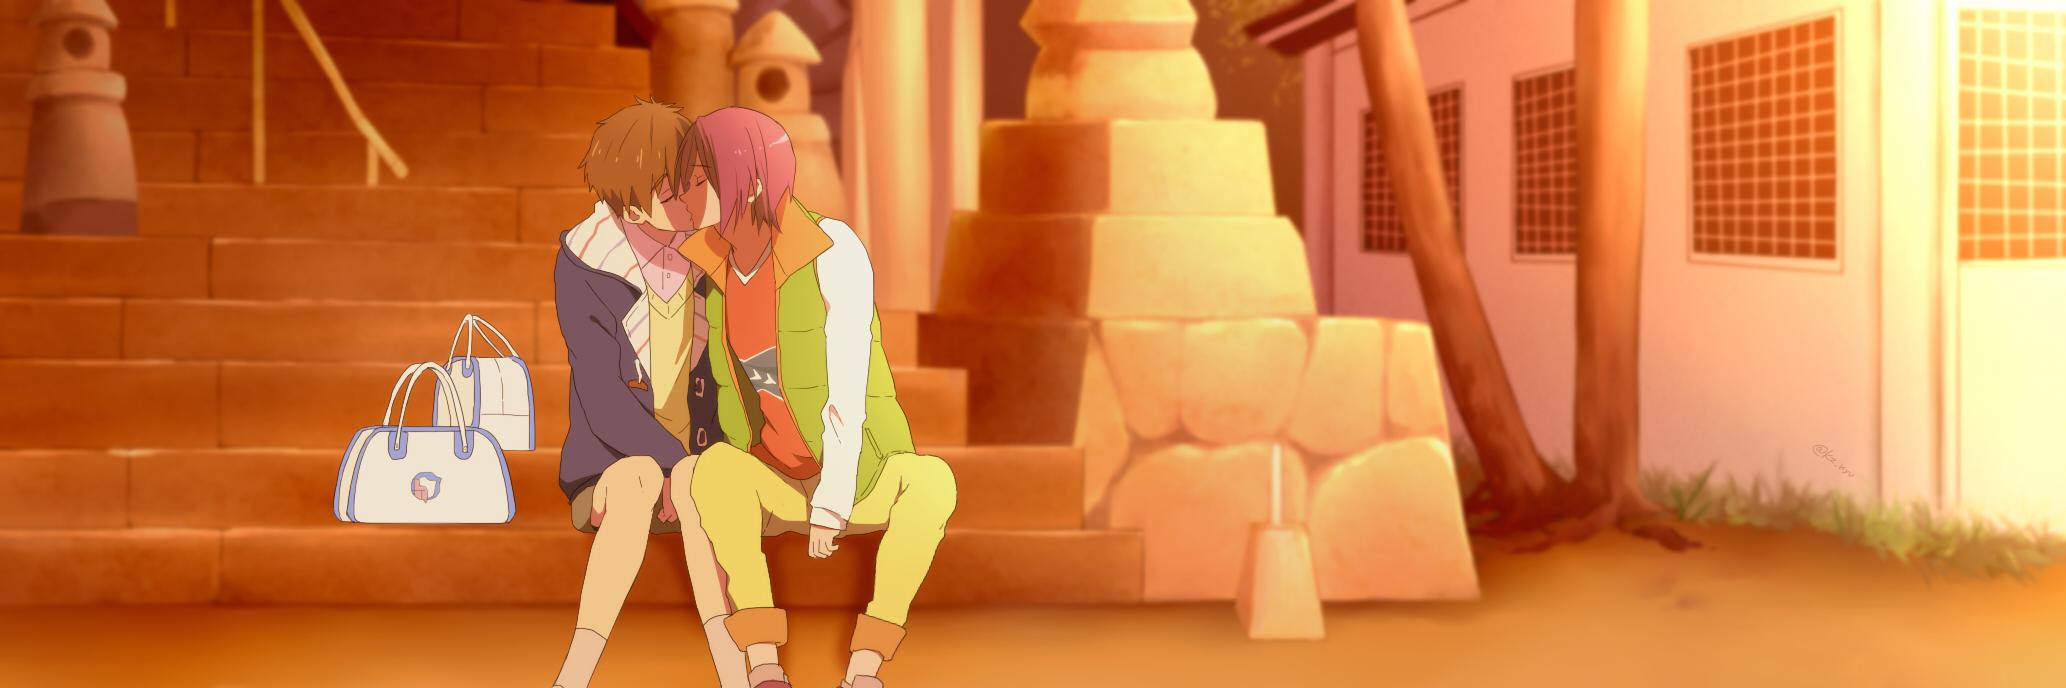 Free Image 1771572 Zerochan Anime Image Board See more fan art related to #haruka nanase , #free! free image 1771572 zerochan anime